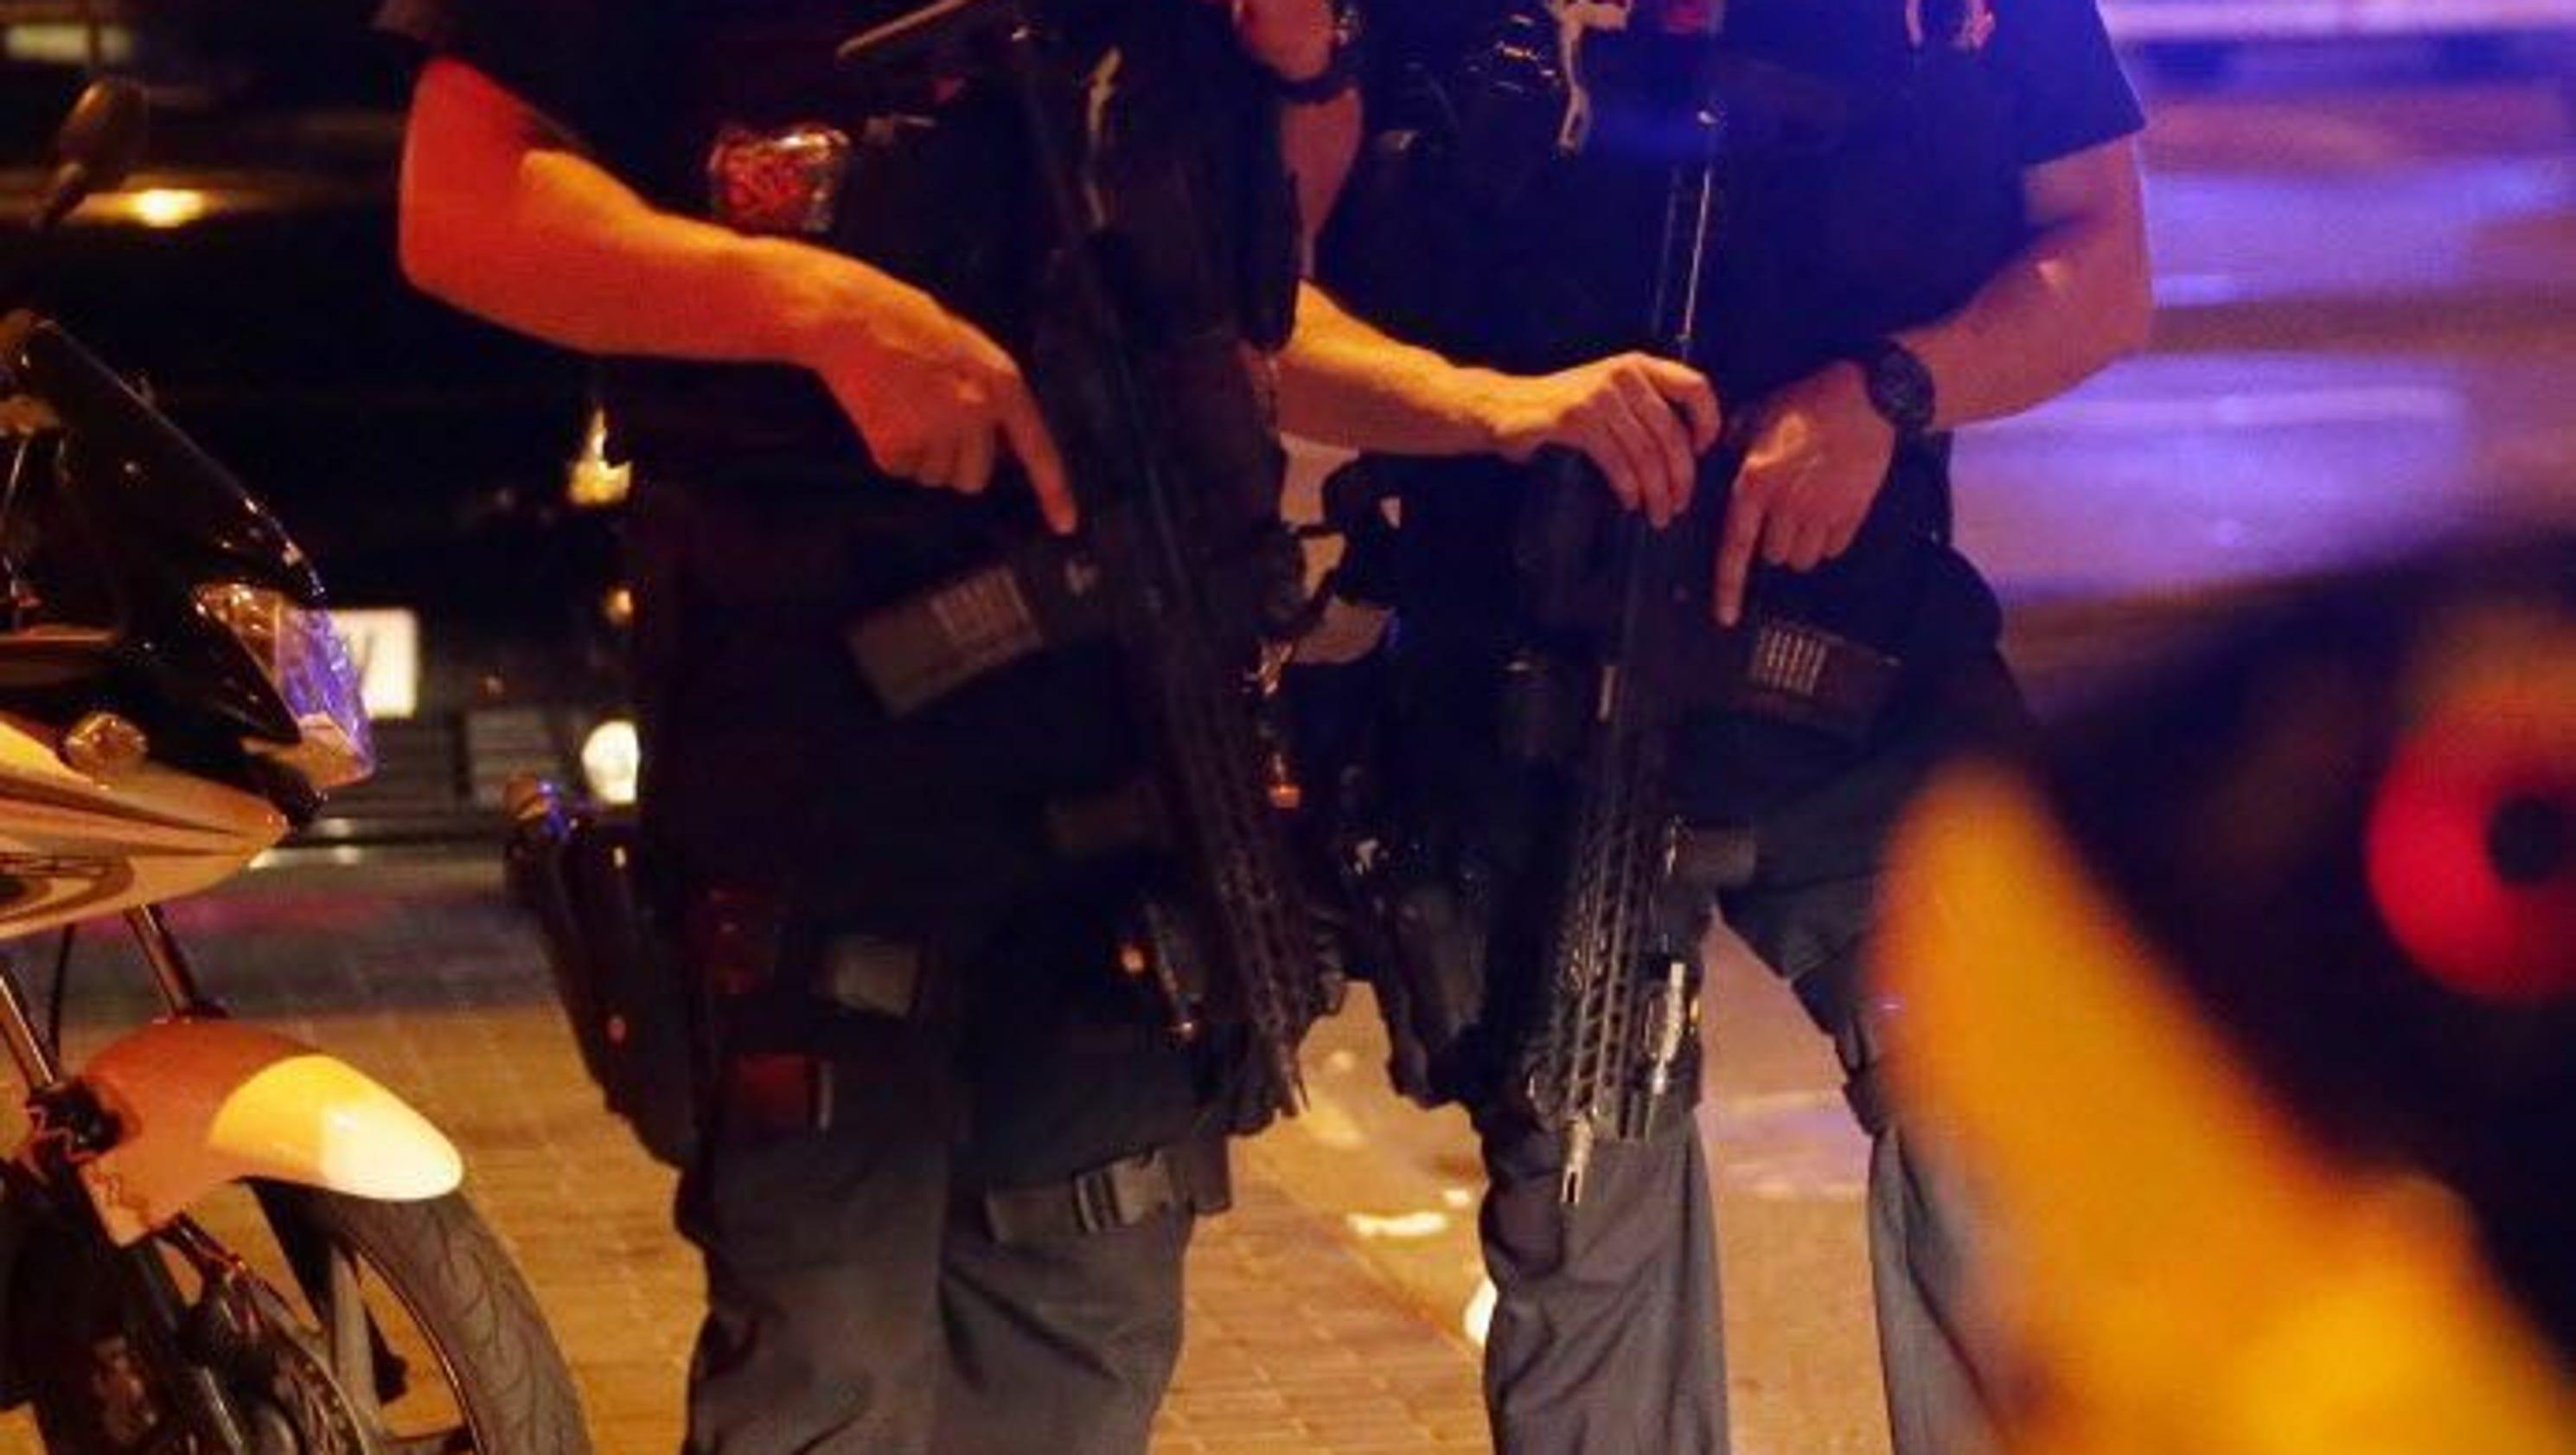 Police: Van strikes worshipers near London mosque